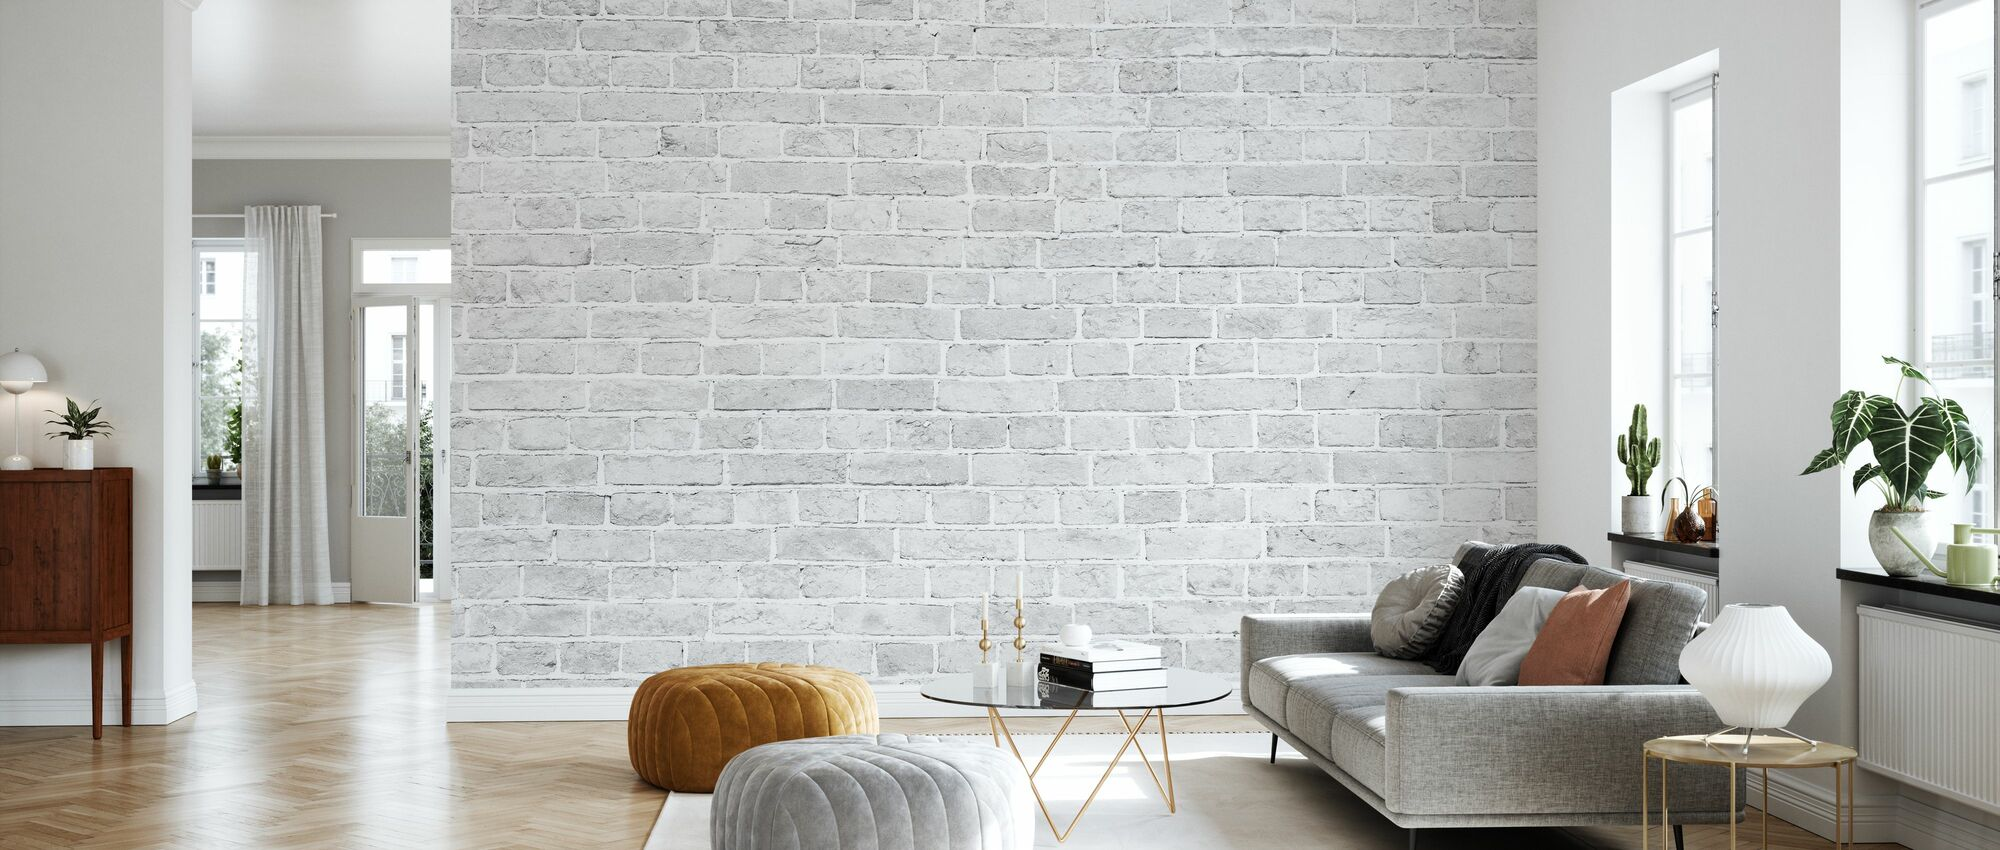 Witte Wash bakstenen muur - Behang - Woonkamer